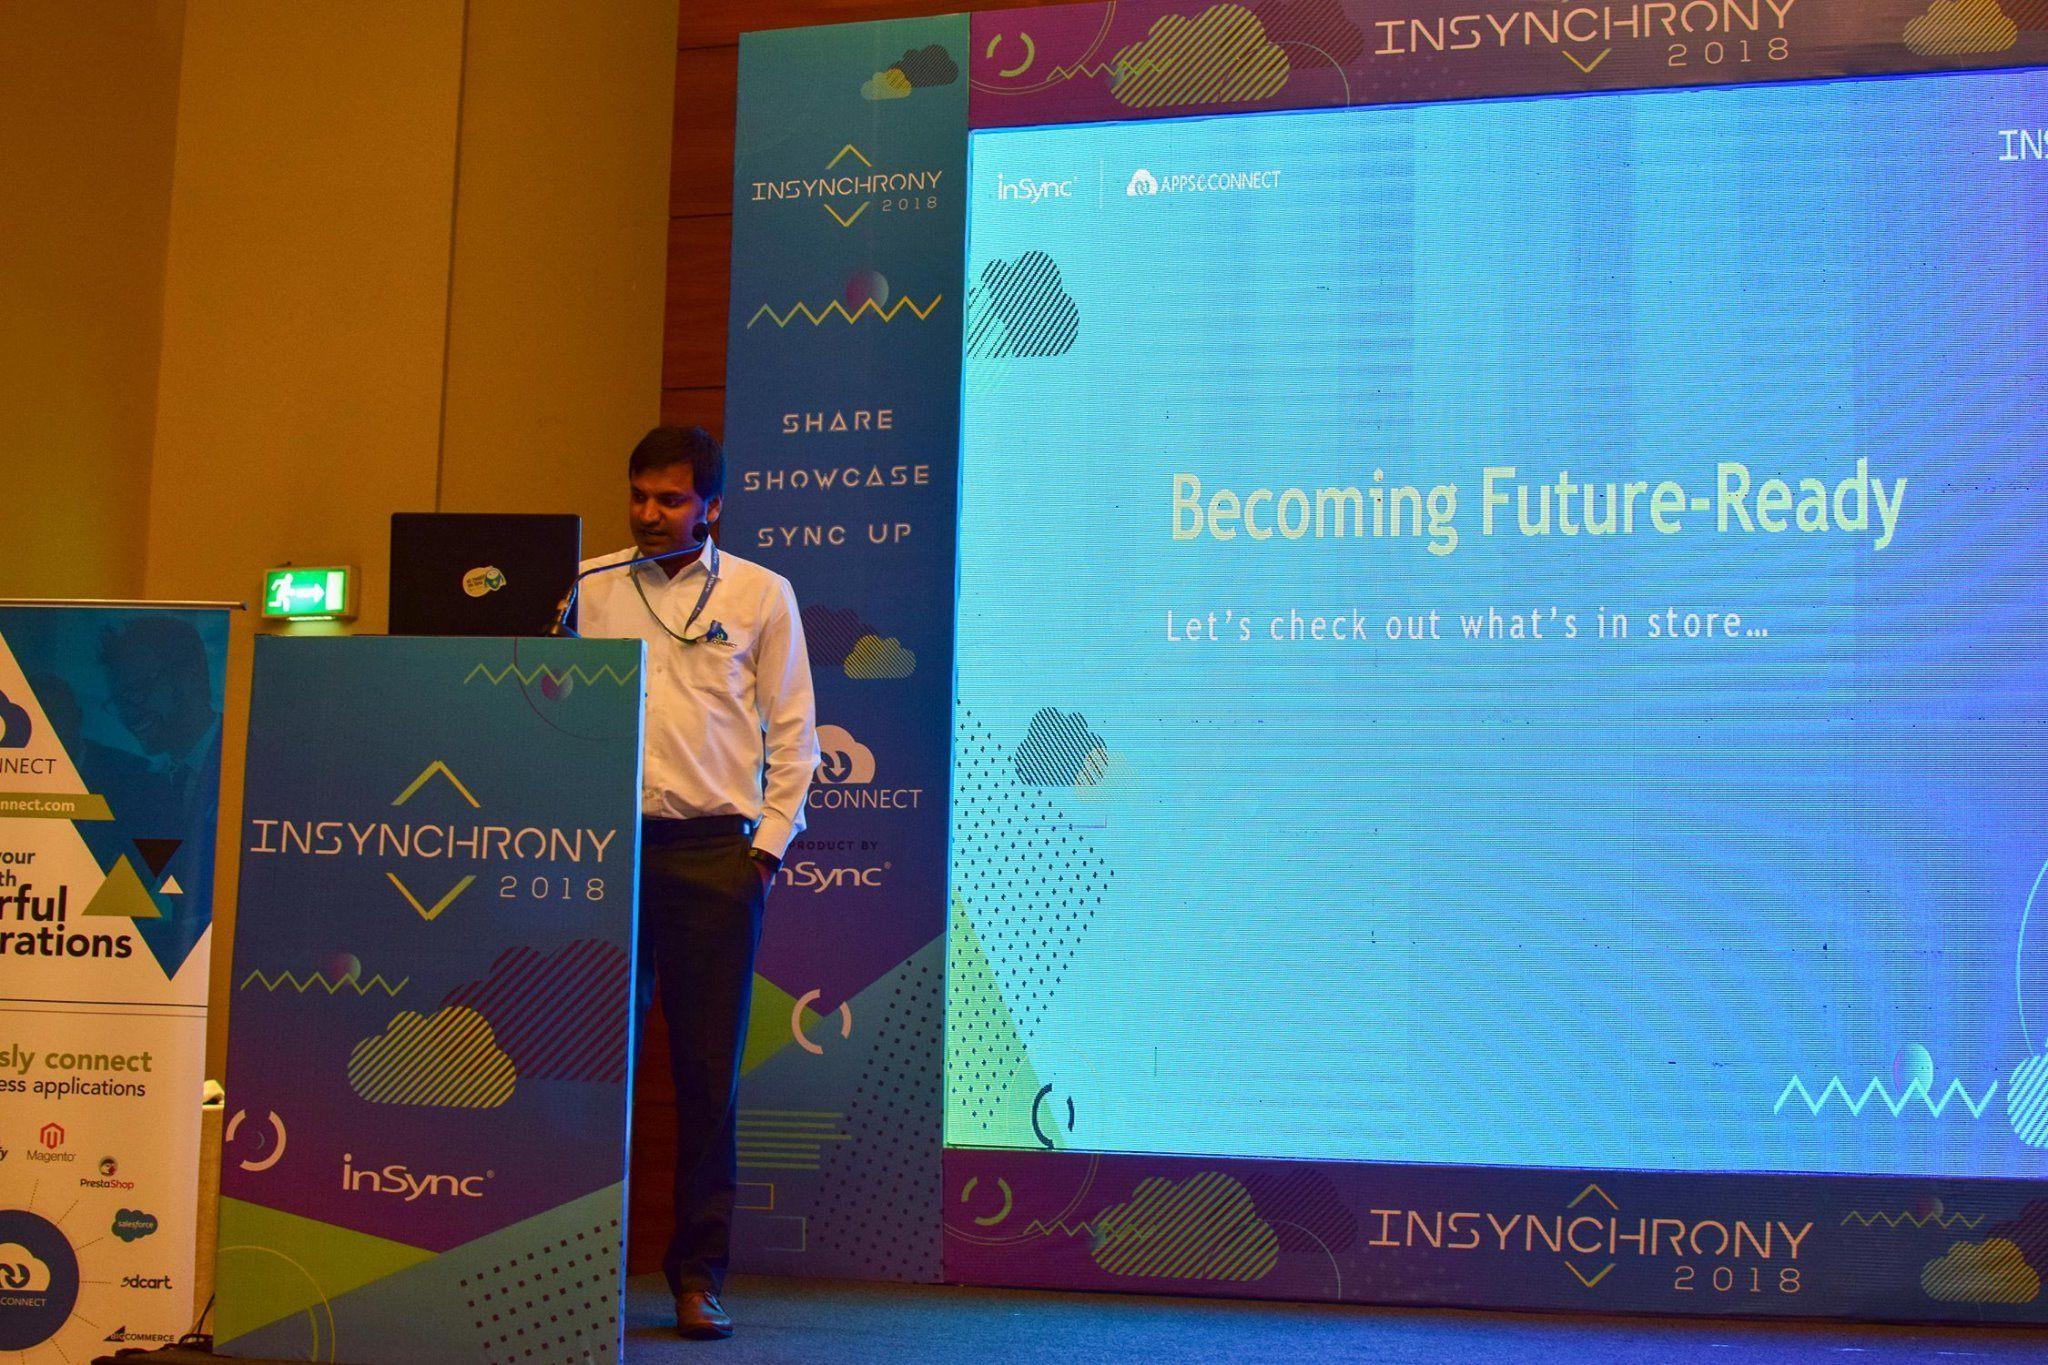 Atul-Gupta-InSync-CEO-at-InSynchrony